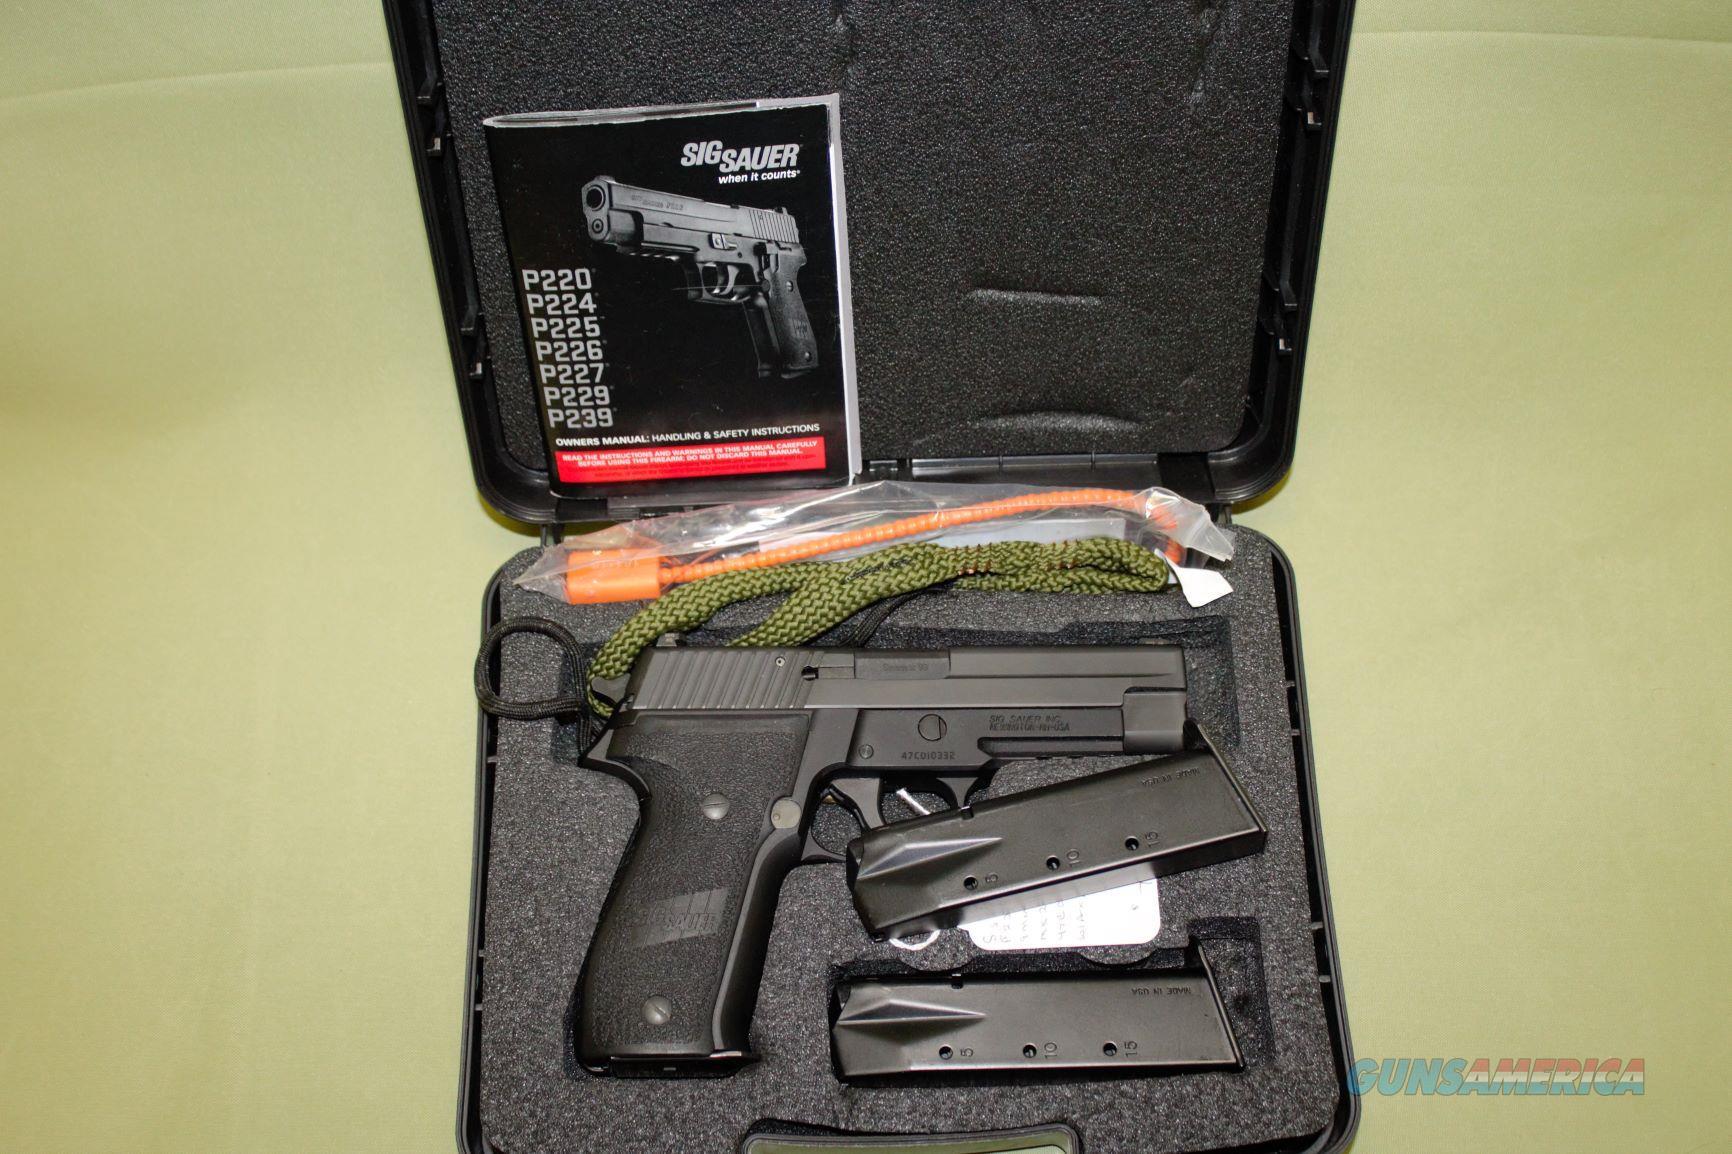 SigSauer P226 MK 25 9mm  Guns > Pistols > Sig - Sauer/Sigarms Pistols > P226